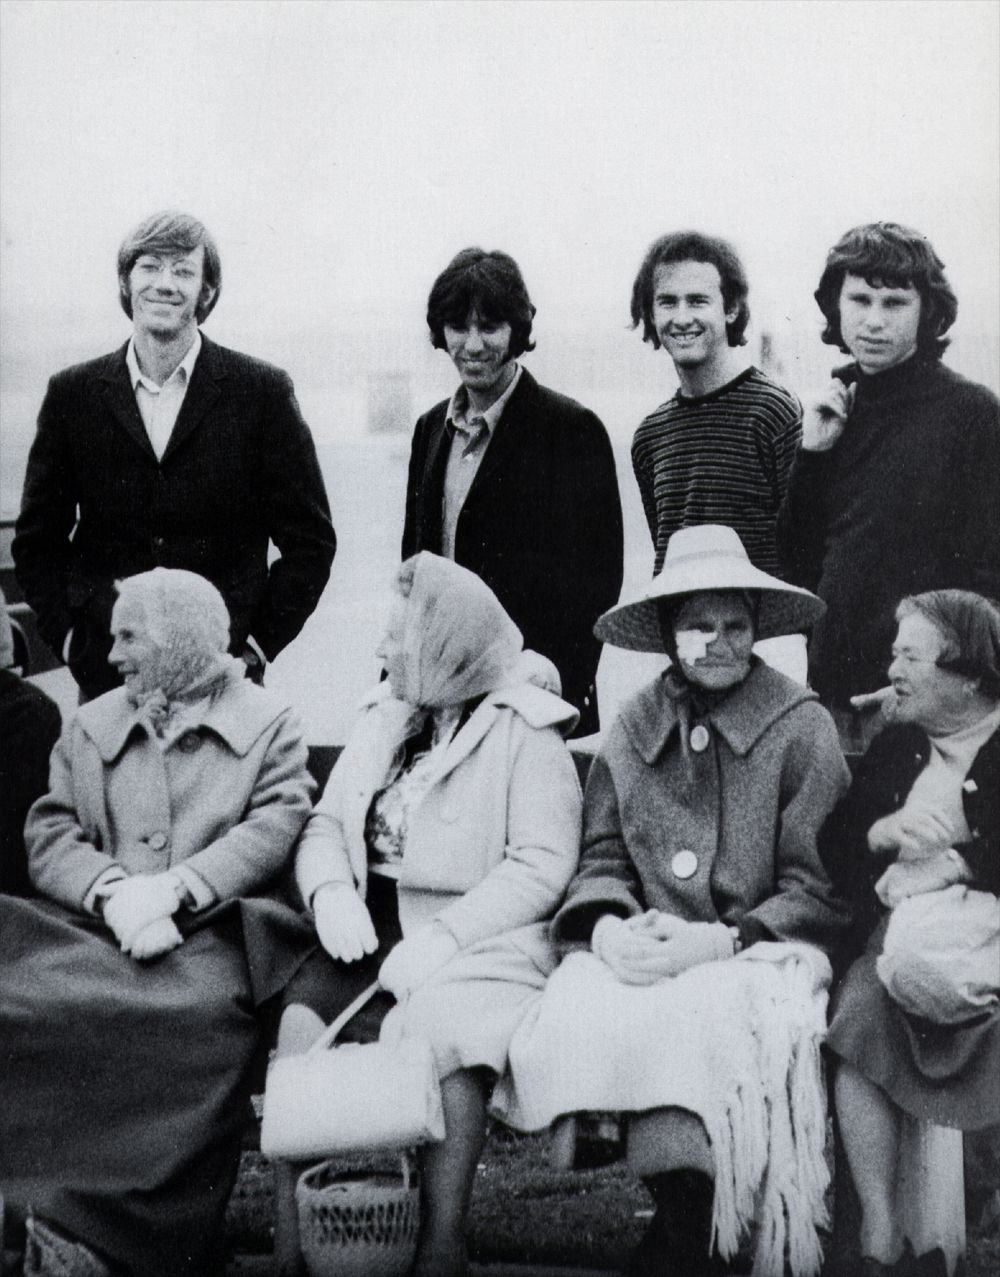 doors1966  sc 1 st  Pinterest & doors1966 | Jim Morrison ❤️The Doors ☮ | Pinterest | Jim morrison ...